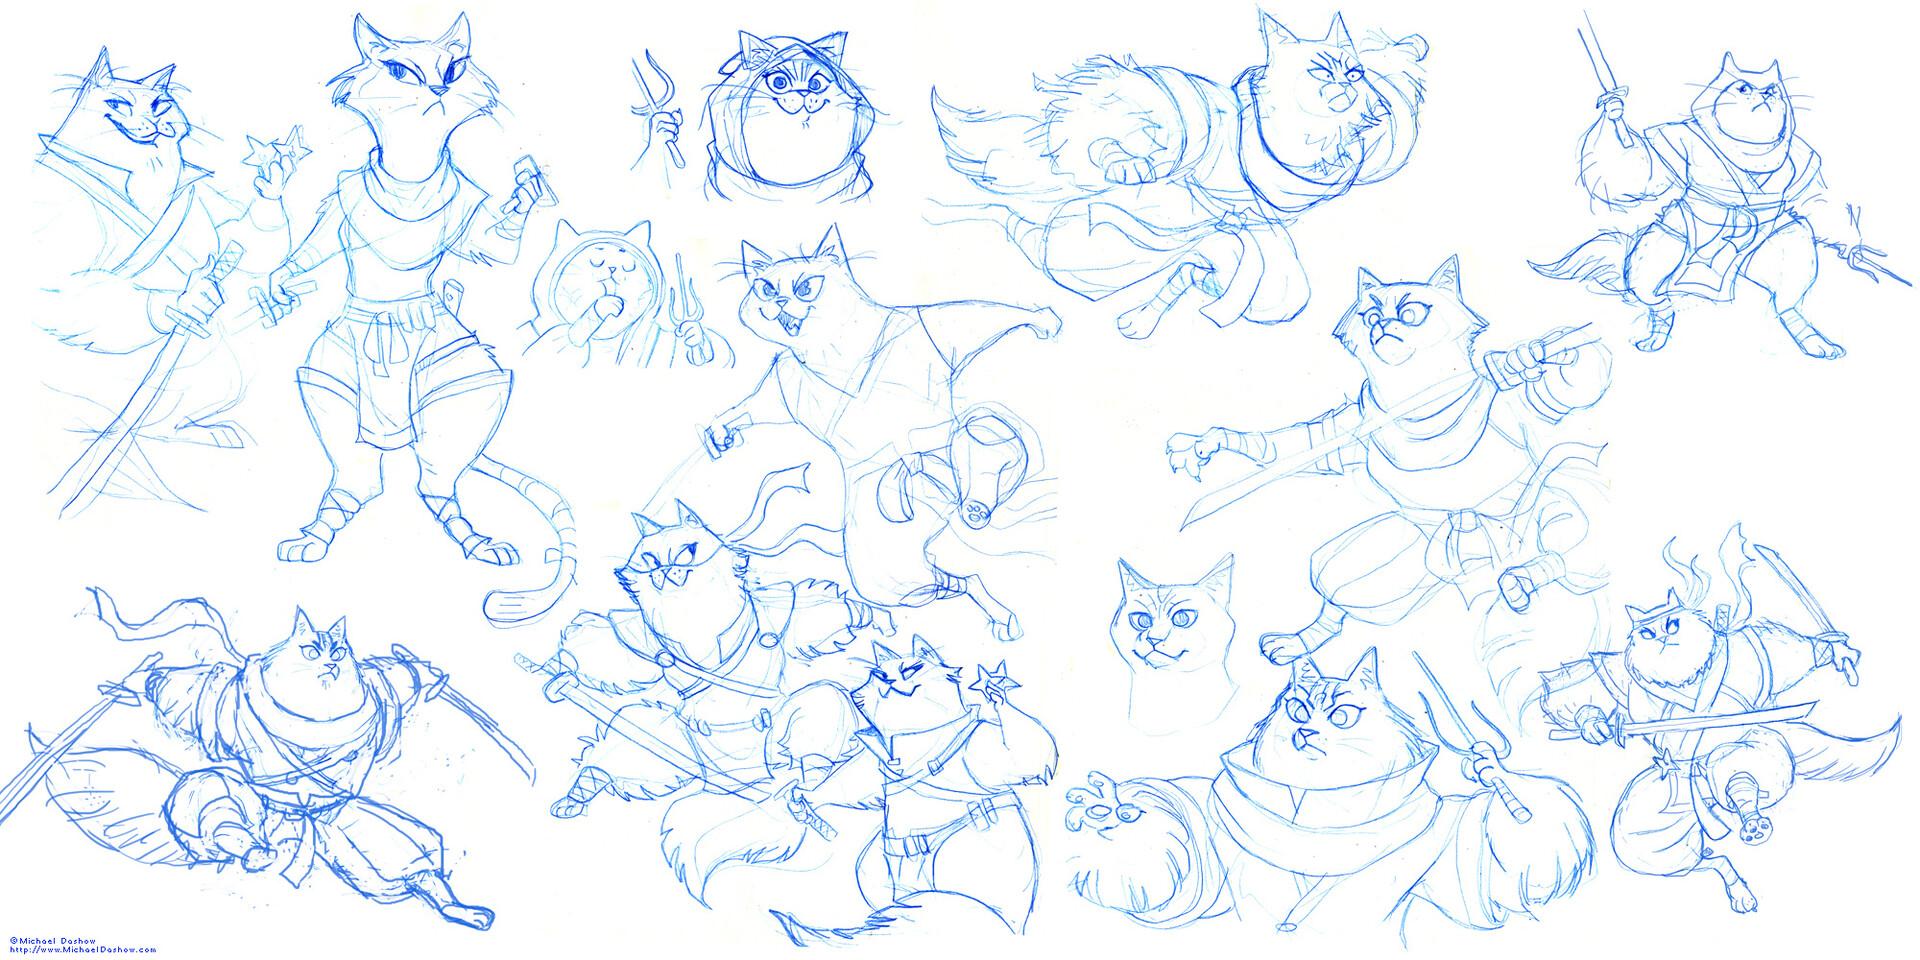 Michael dashow ninja cat 03c d sketches